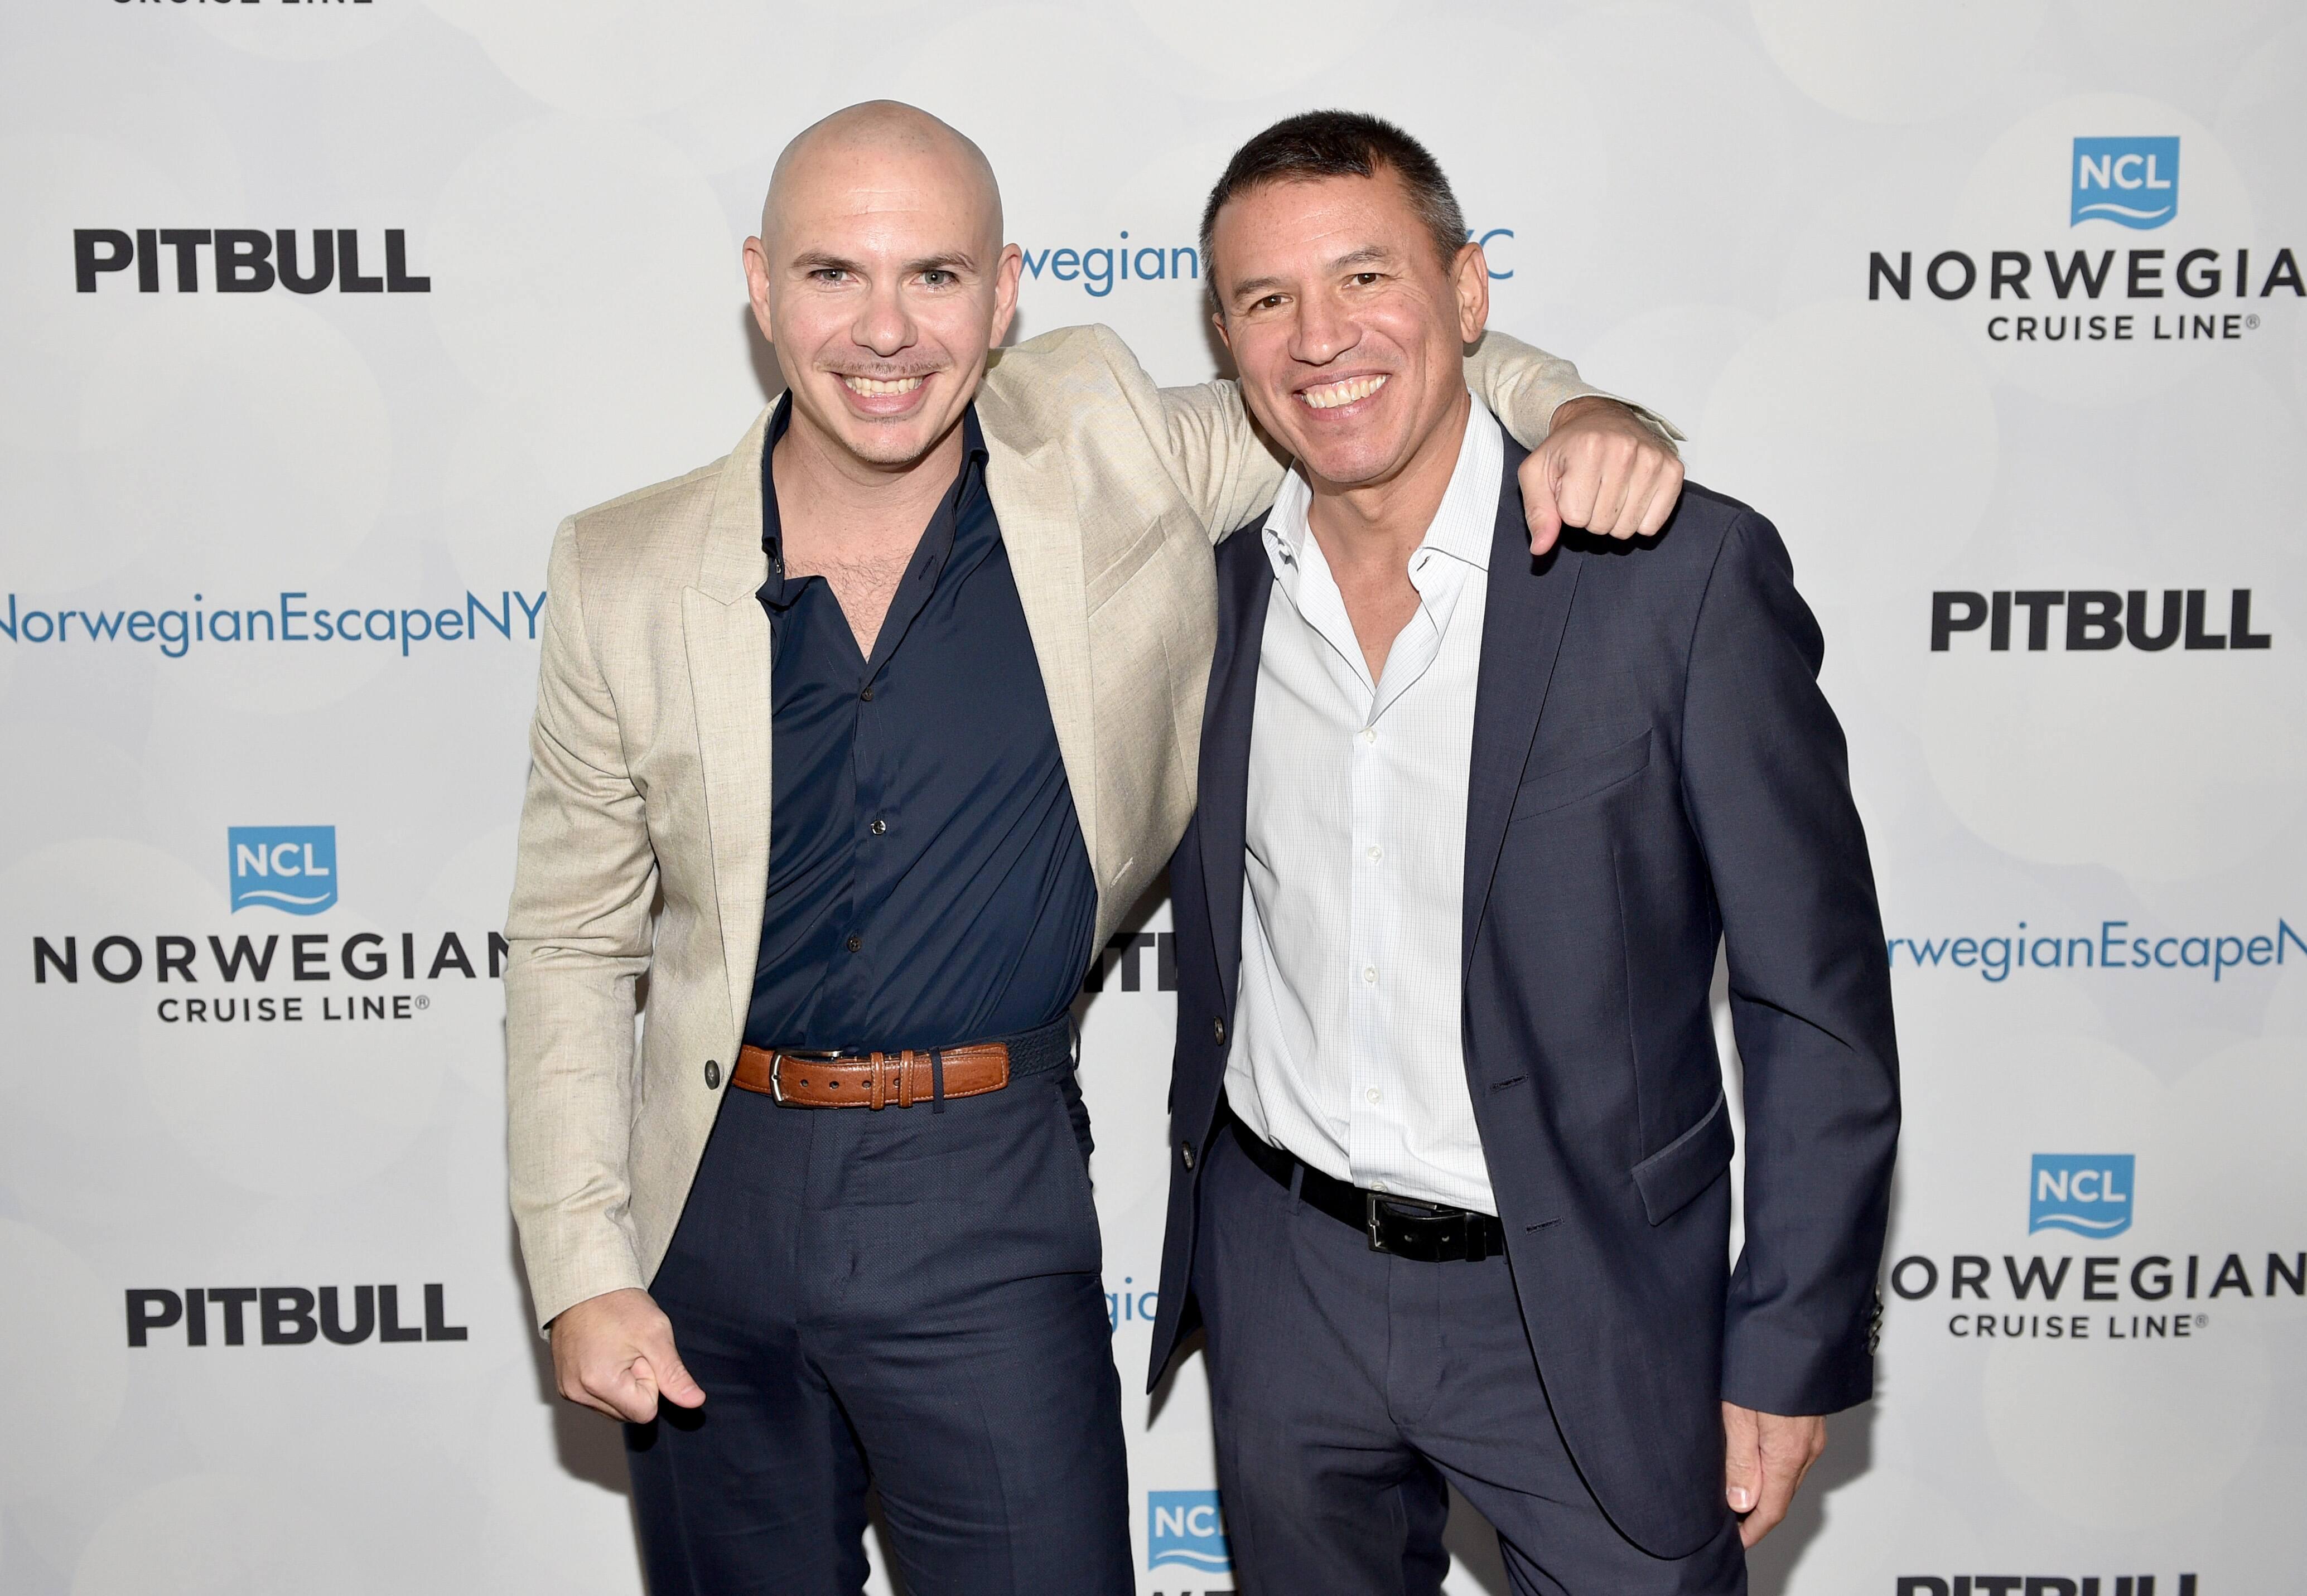 Norwegian Escape NYC Celebration with Pitbull